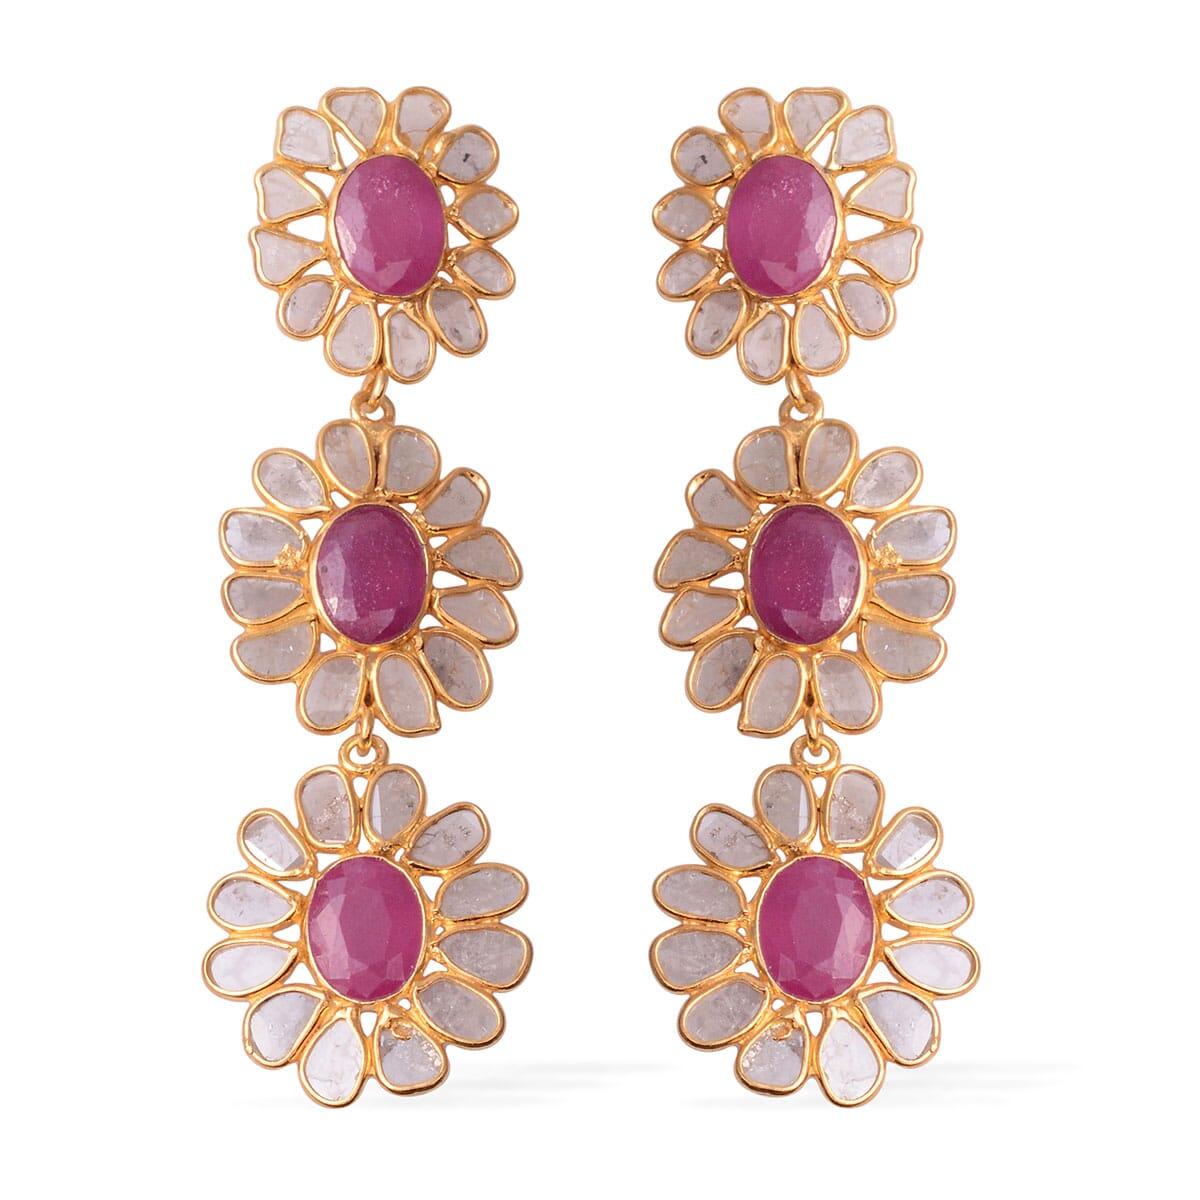 d49f19431076b Ruby, Polki Diamond (3.75 ct) Dangle Earrings in Vermeil YG Over Sterling  Silver 13.95 ctw